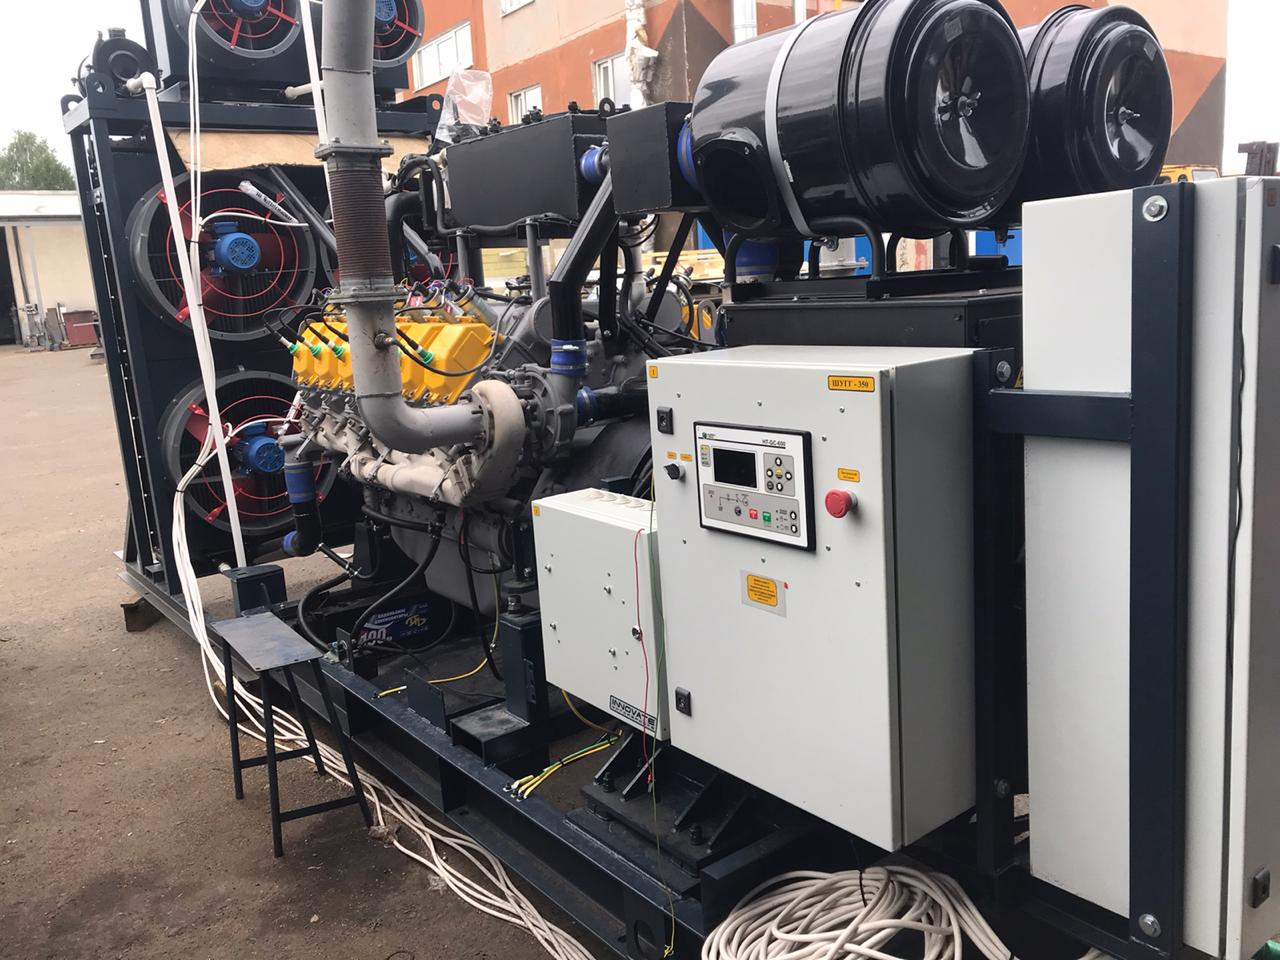 ГПУ 2500 кВт двигатель ЯМЗ-8503